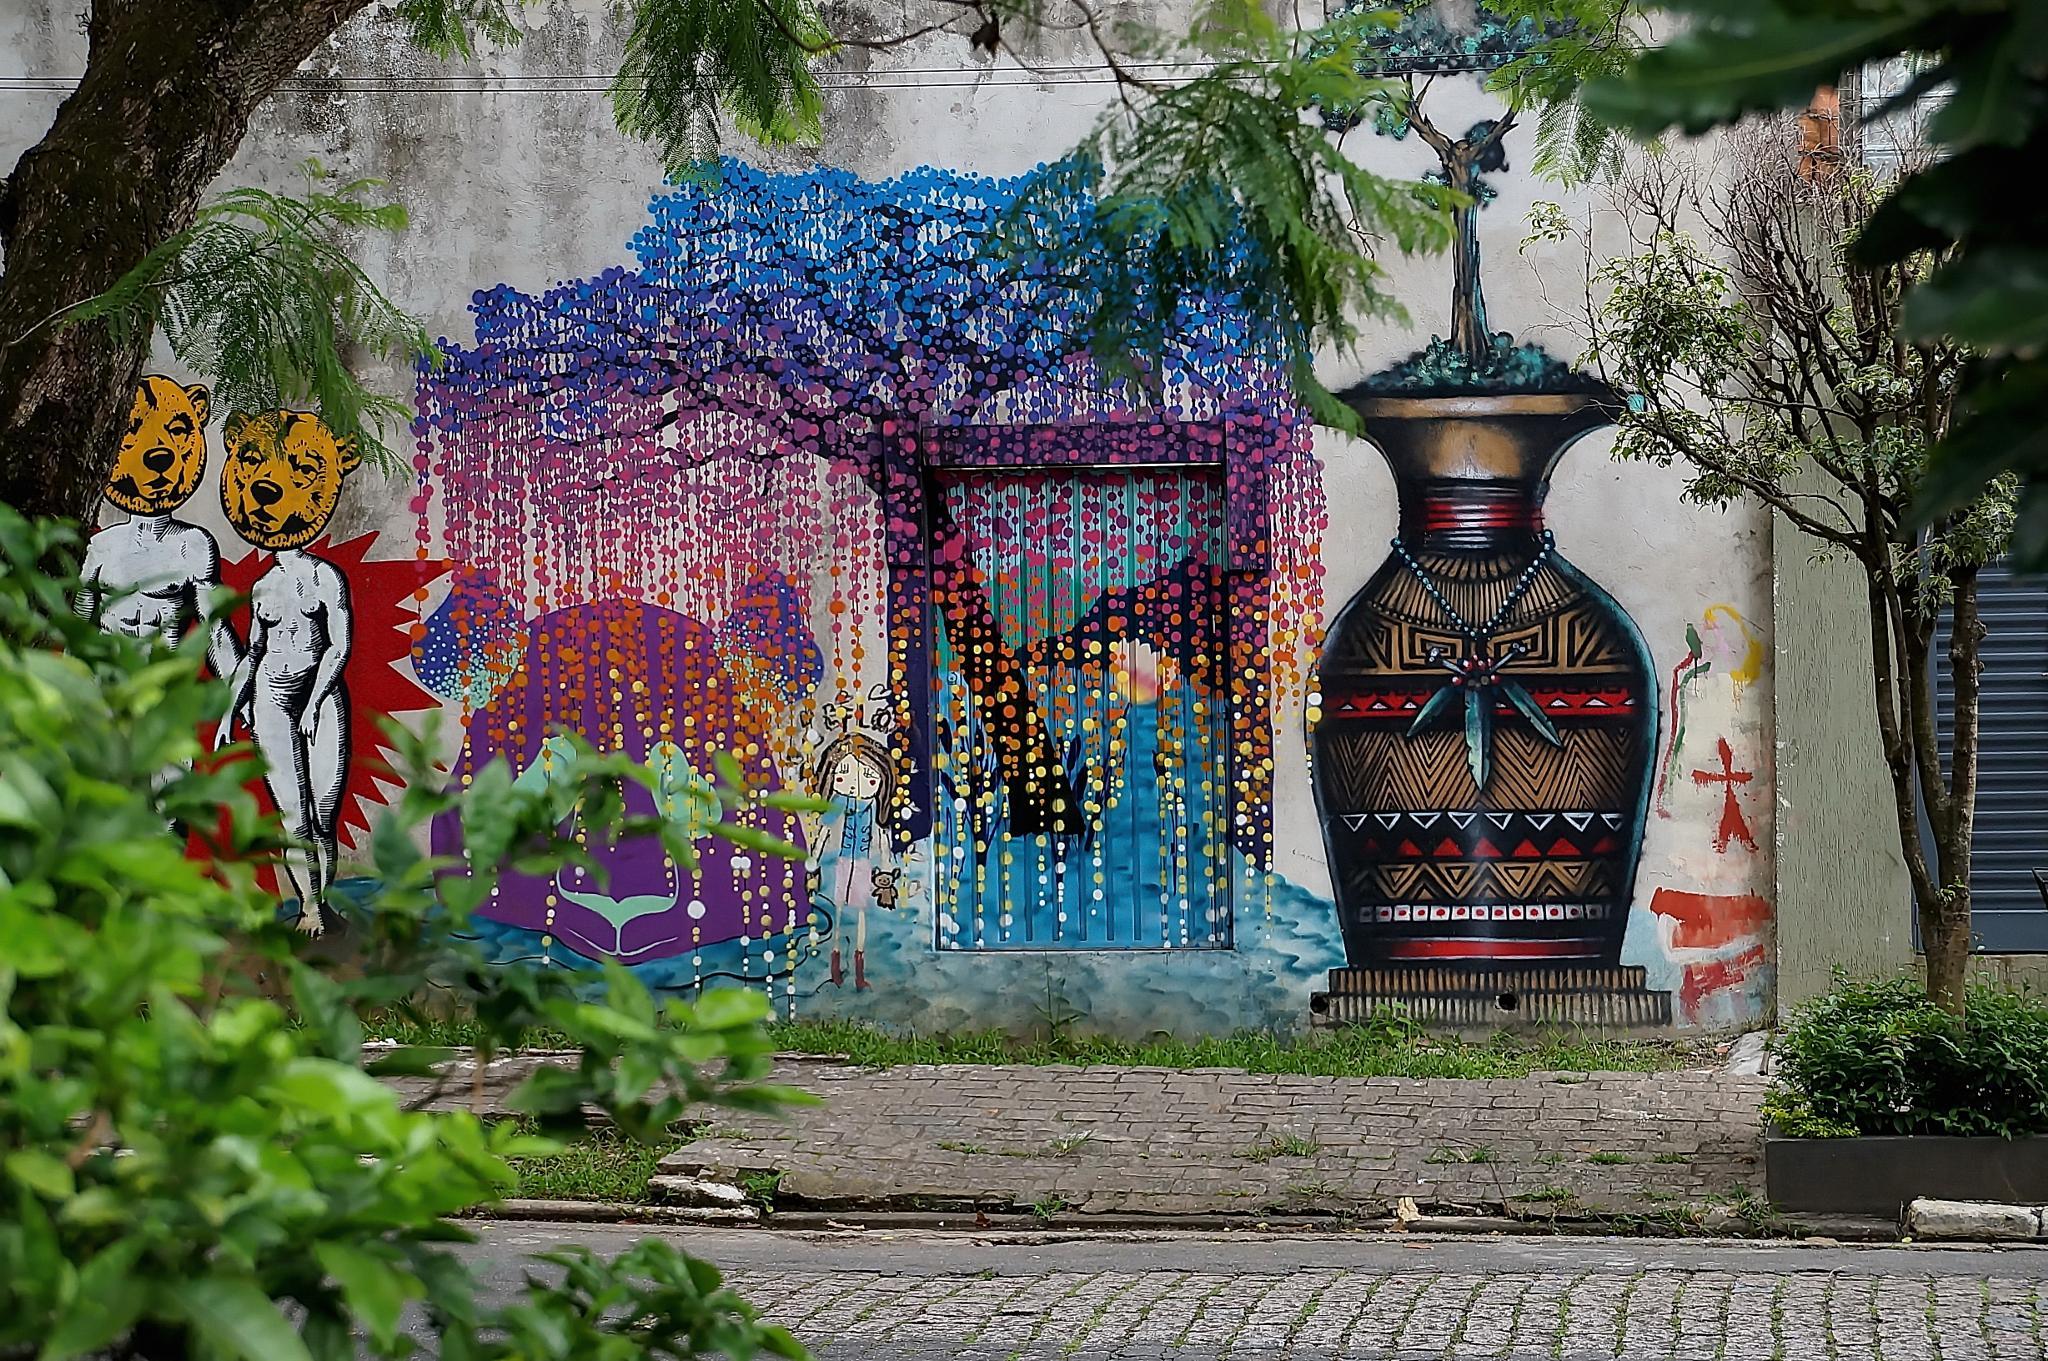 Street art by WSimone